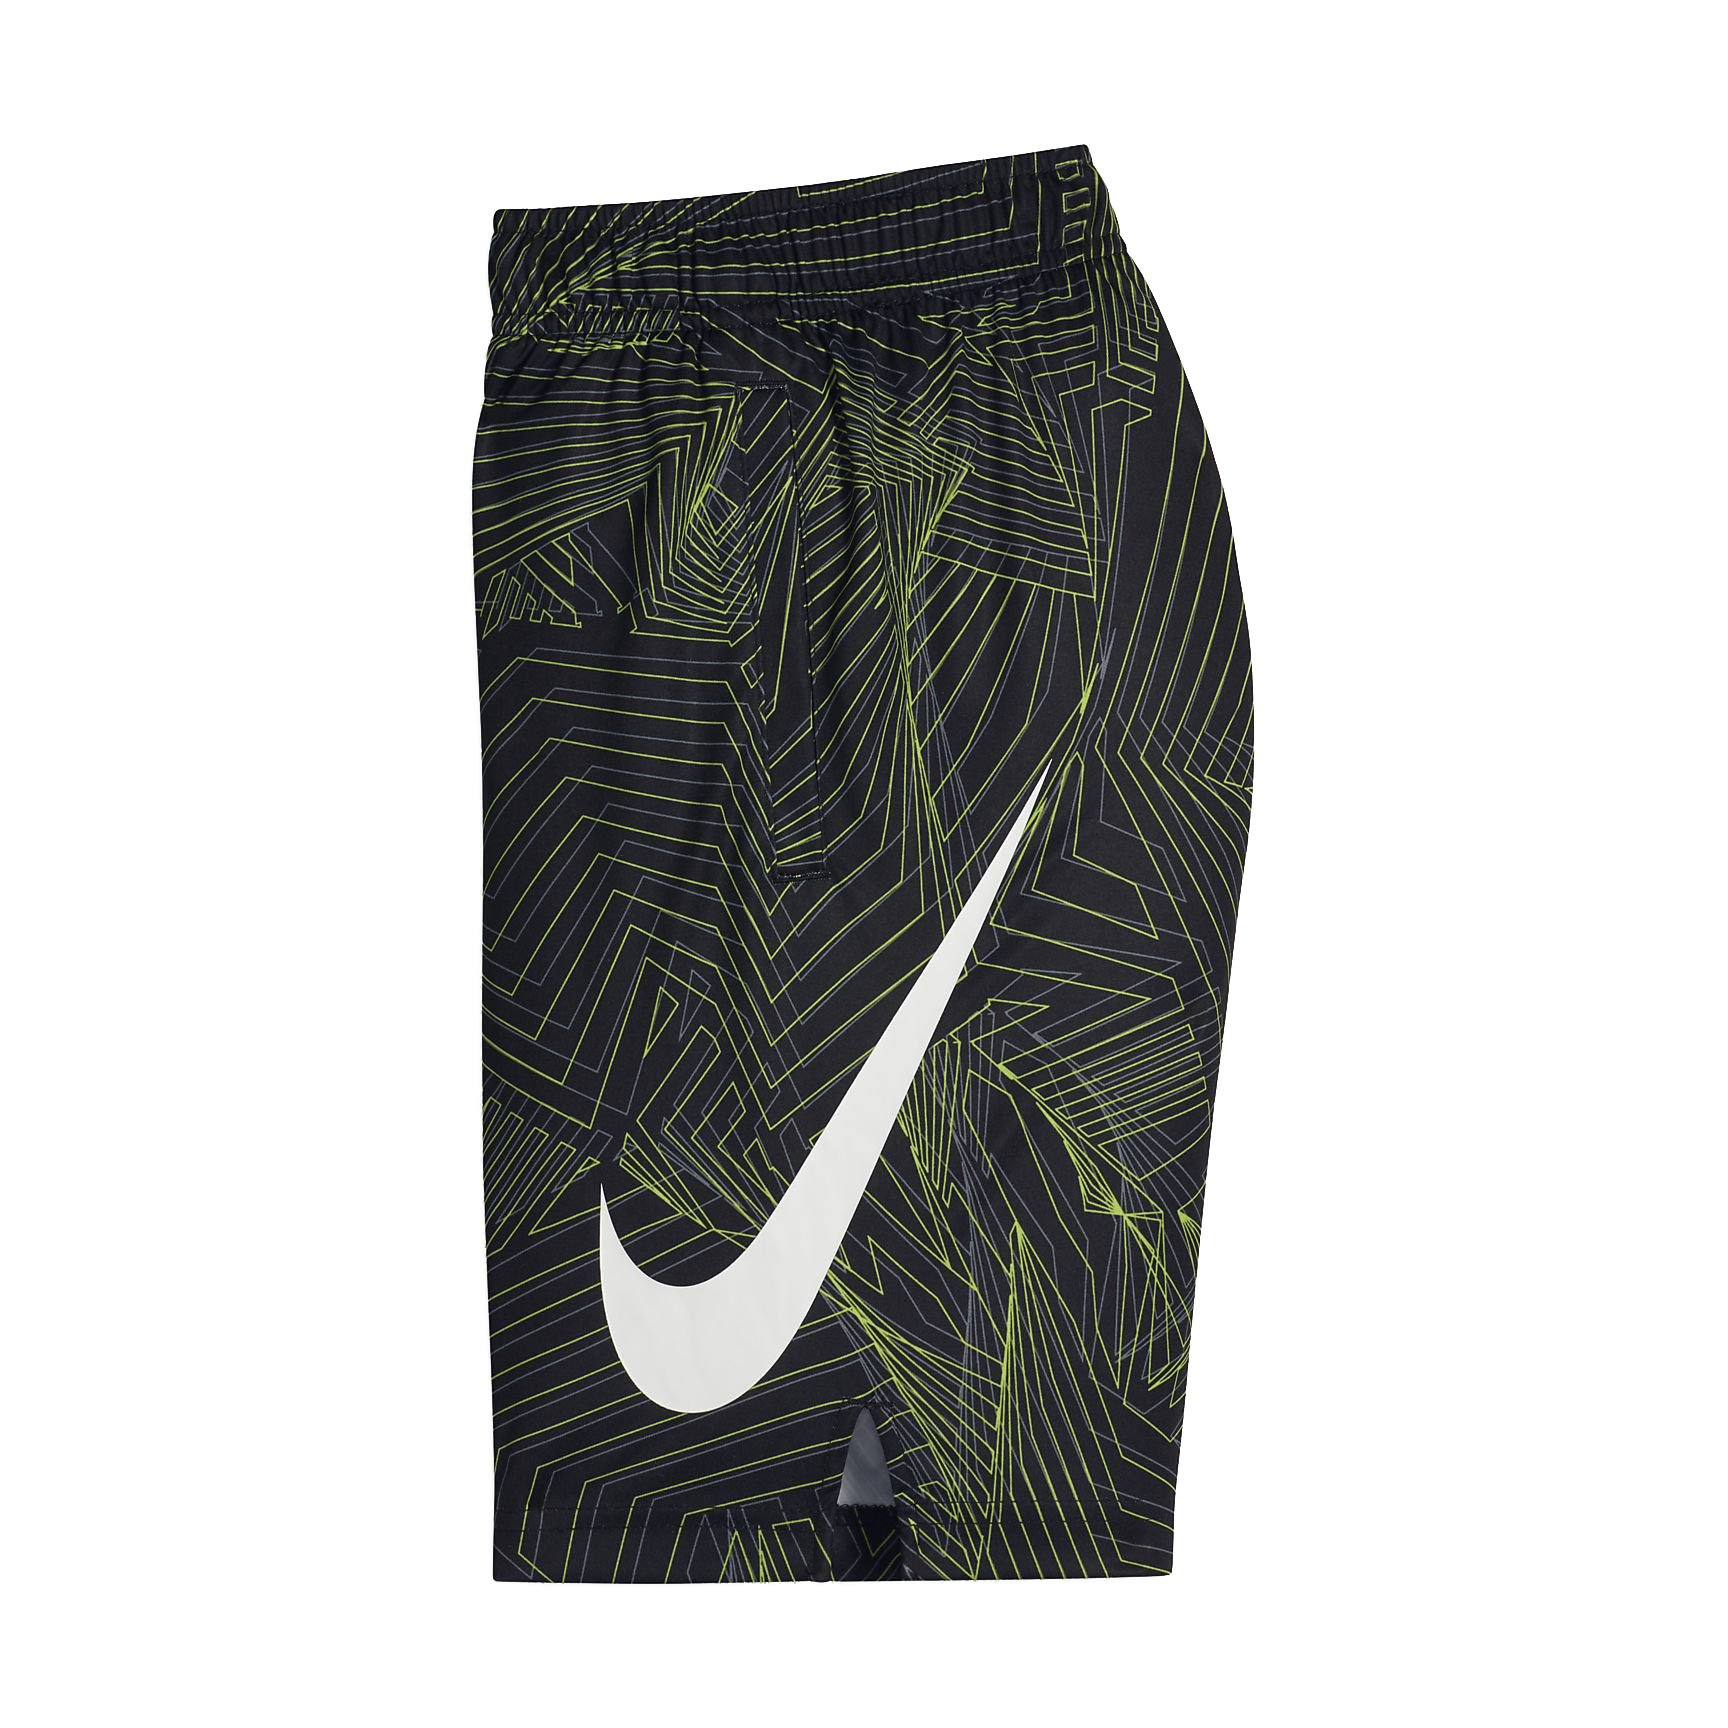 NIKE Big Kids' (Boys') Dri-FIT Training Shorts (Black(892490-010)/Cool Grey, X-Large) by Nike